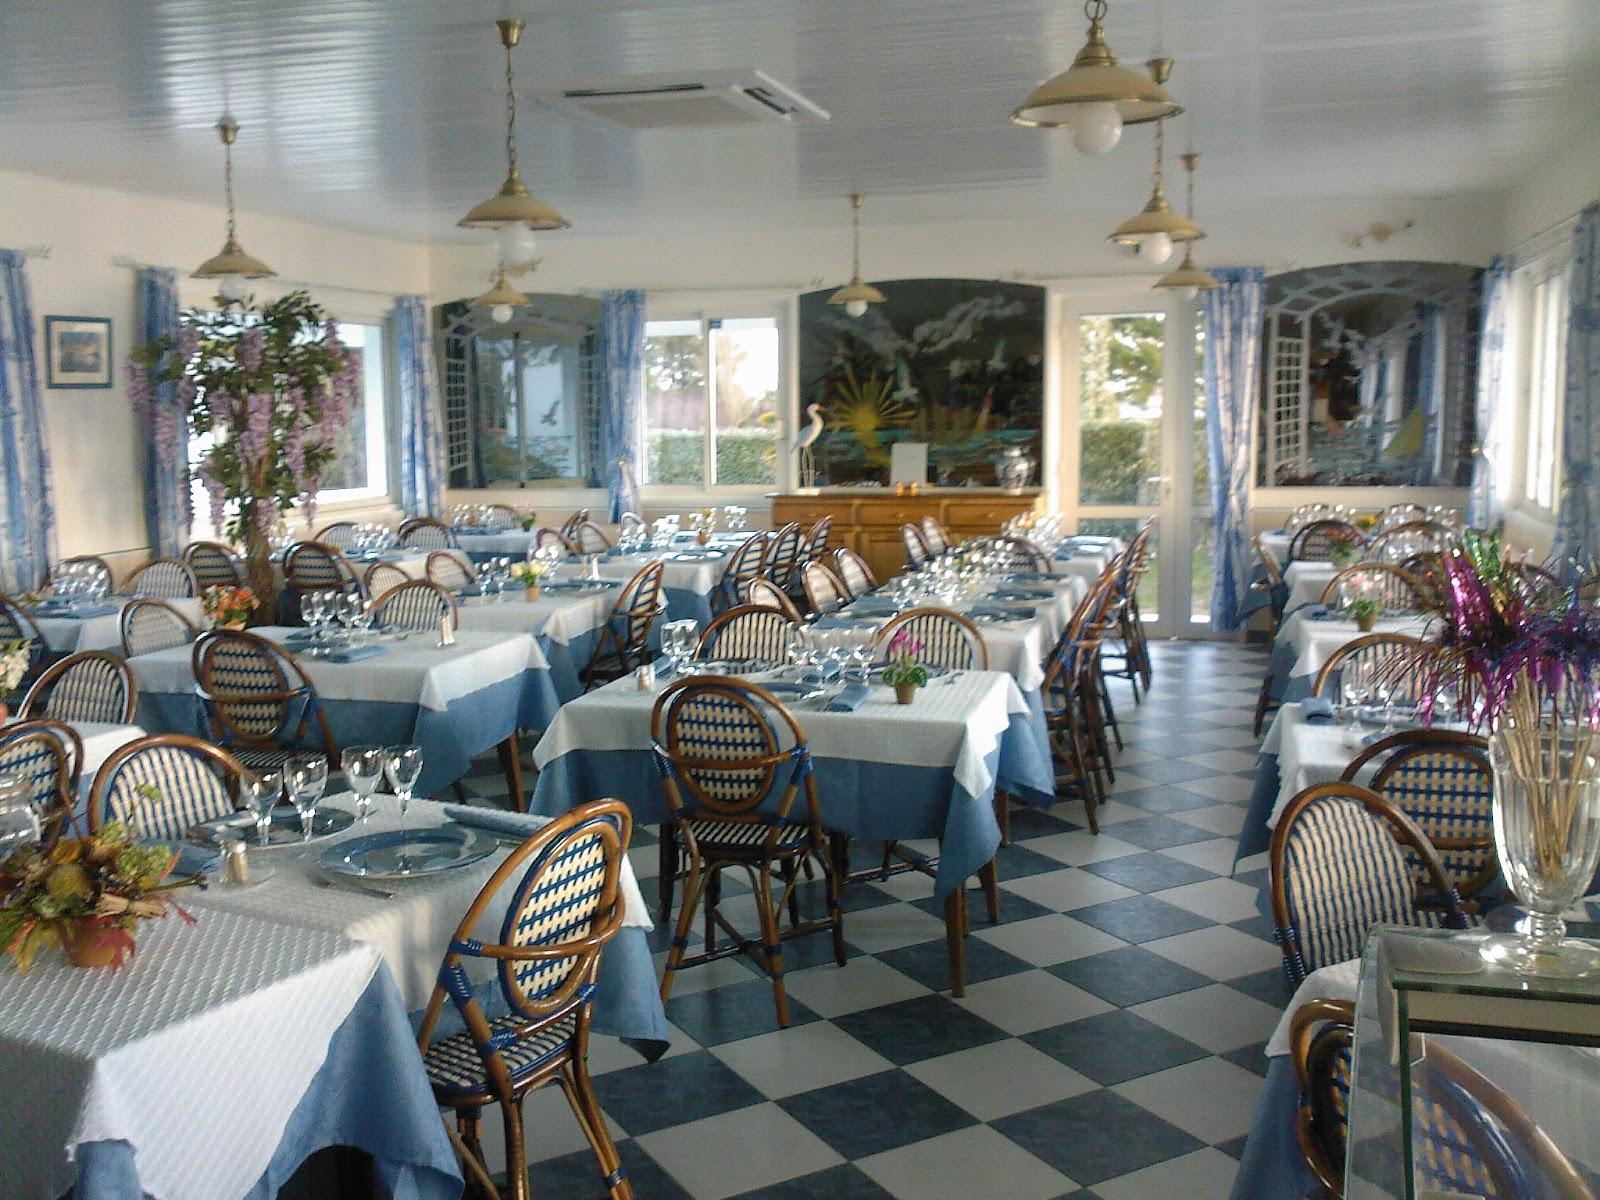 restaurant-la-pergola-l-aiguillon-sur-mer-85-deg-2